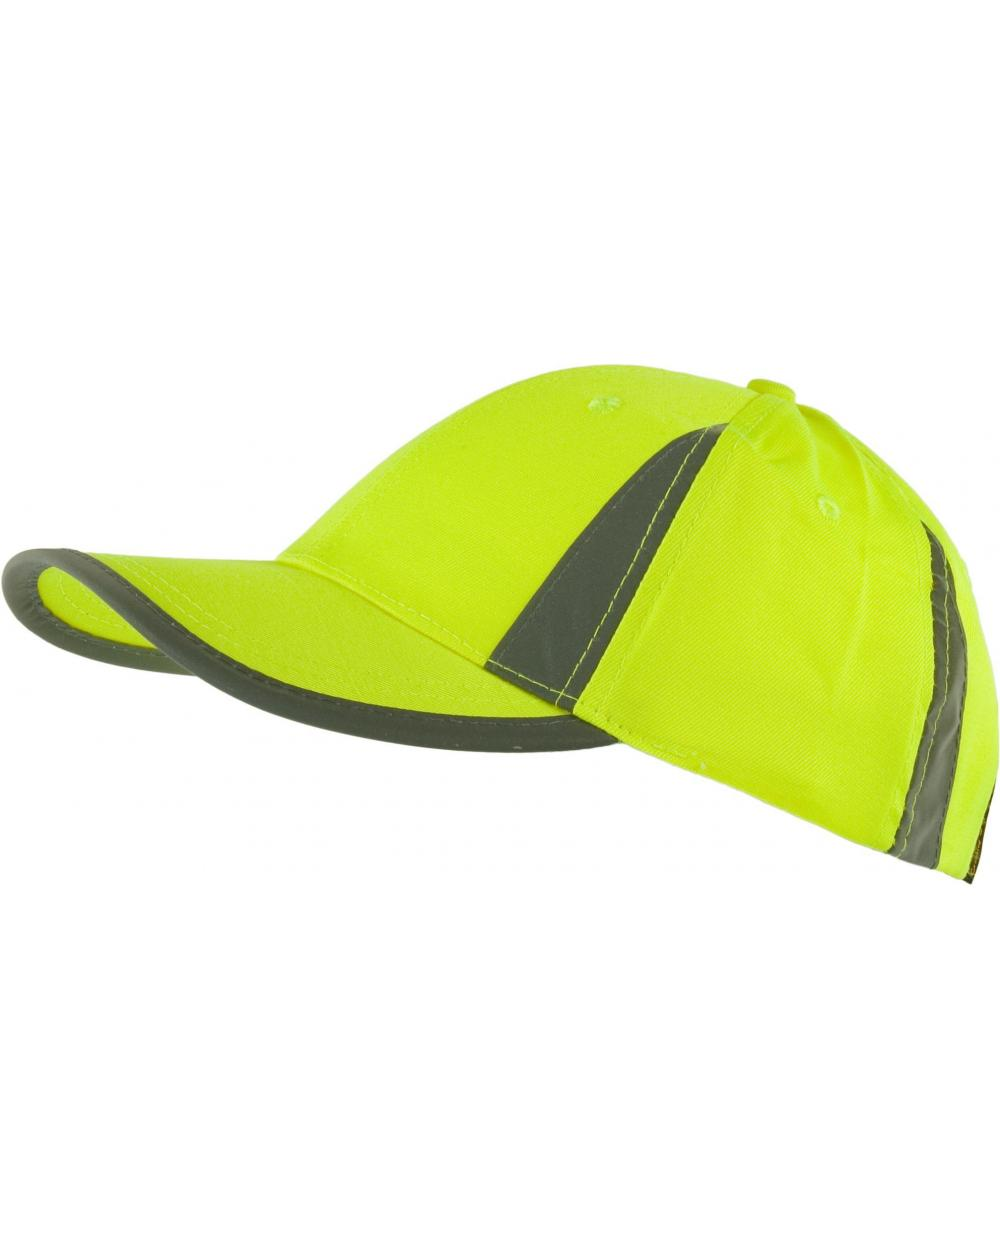 Comprar Gorra de alta visibilidad WFA902 Amarillo AV workteam barato